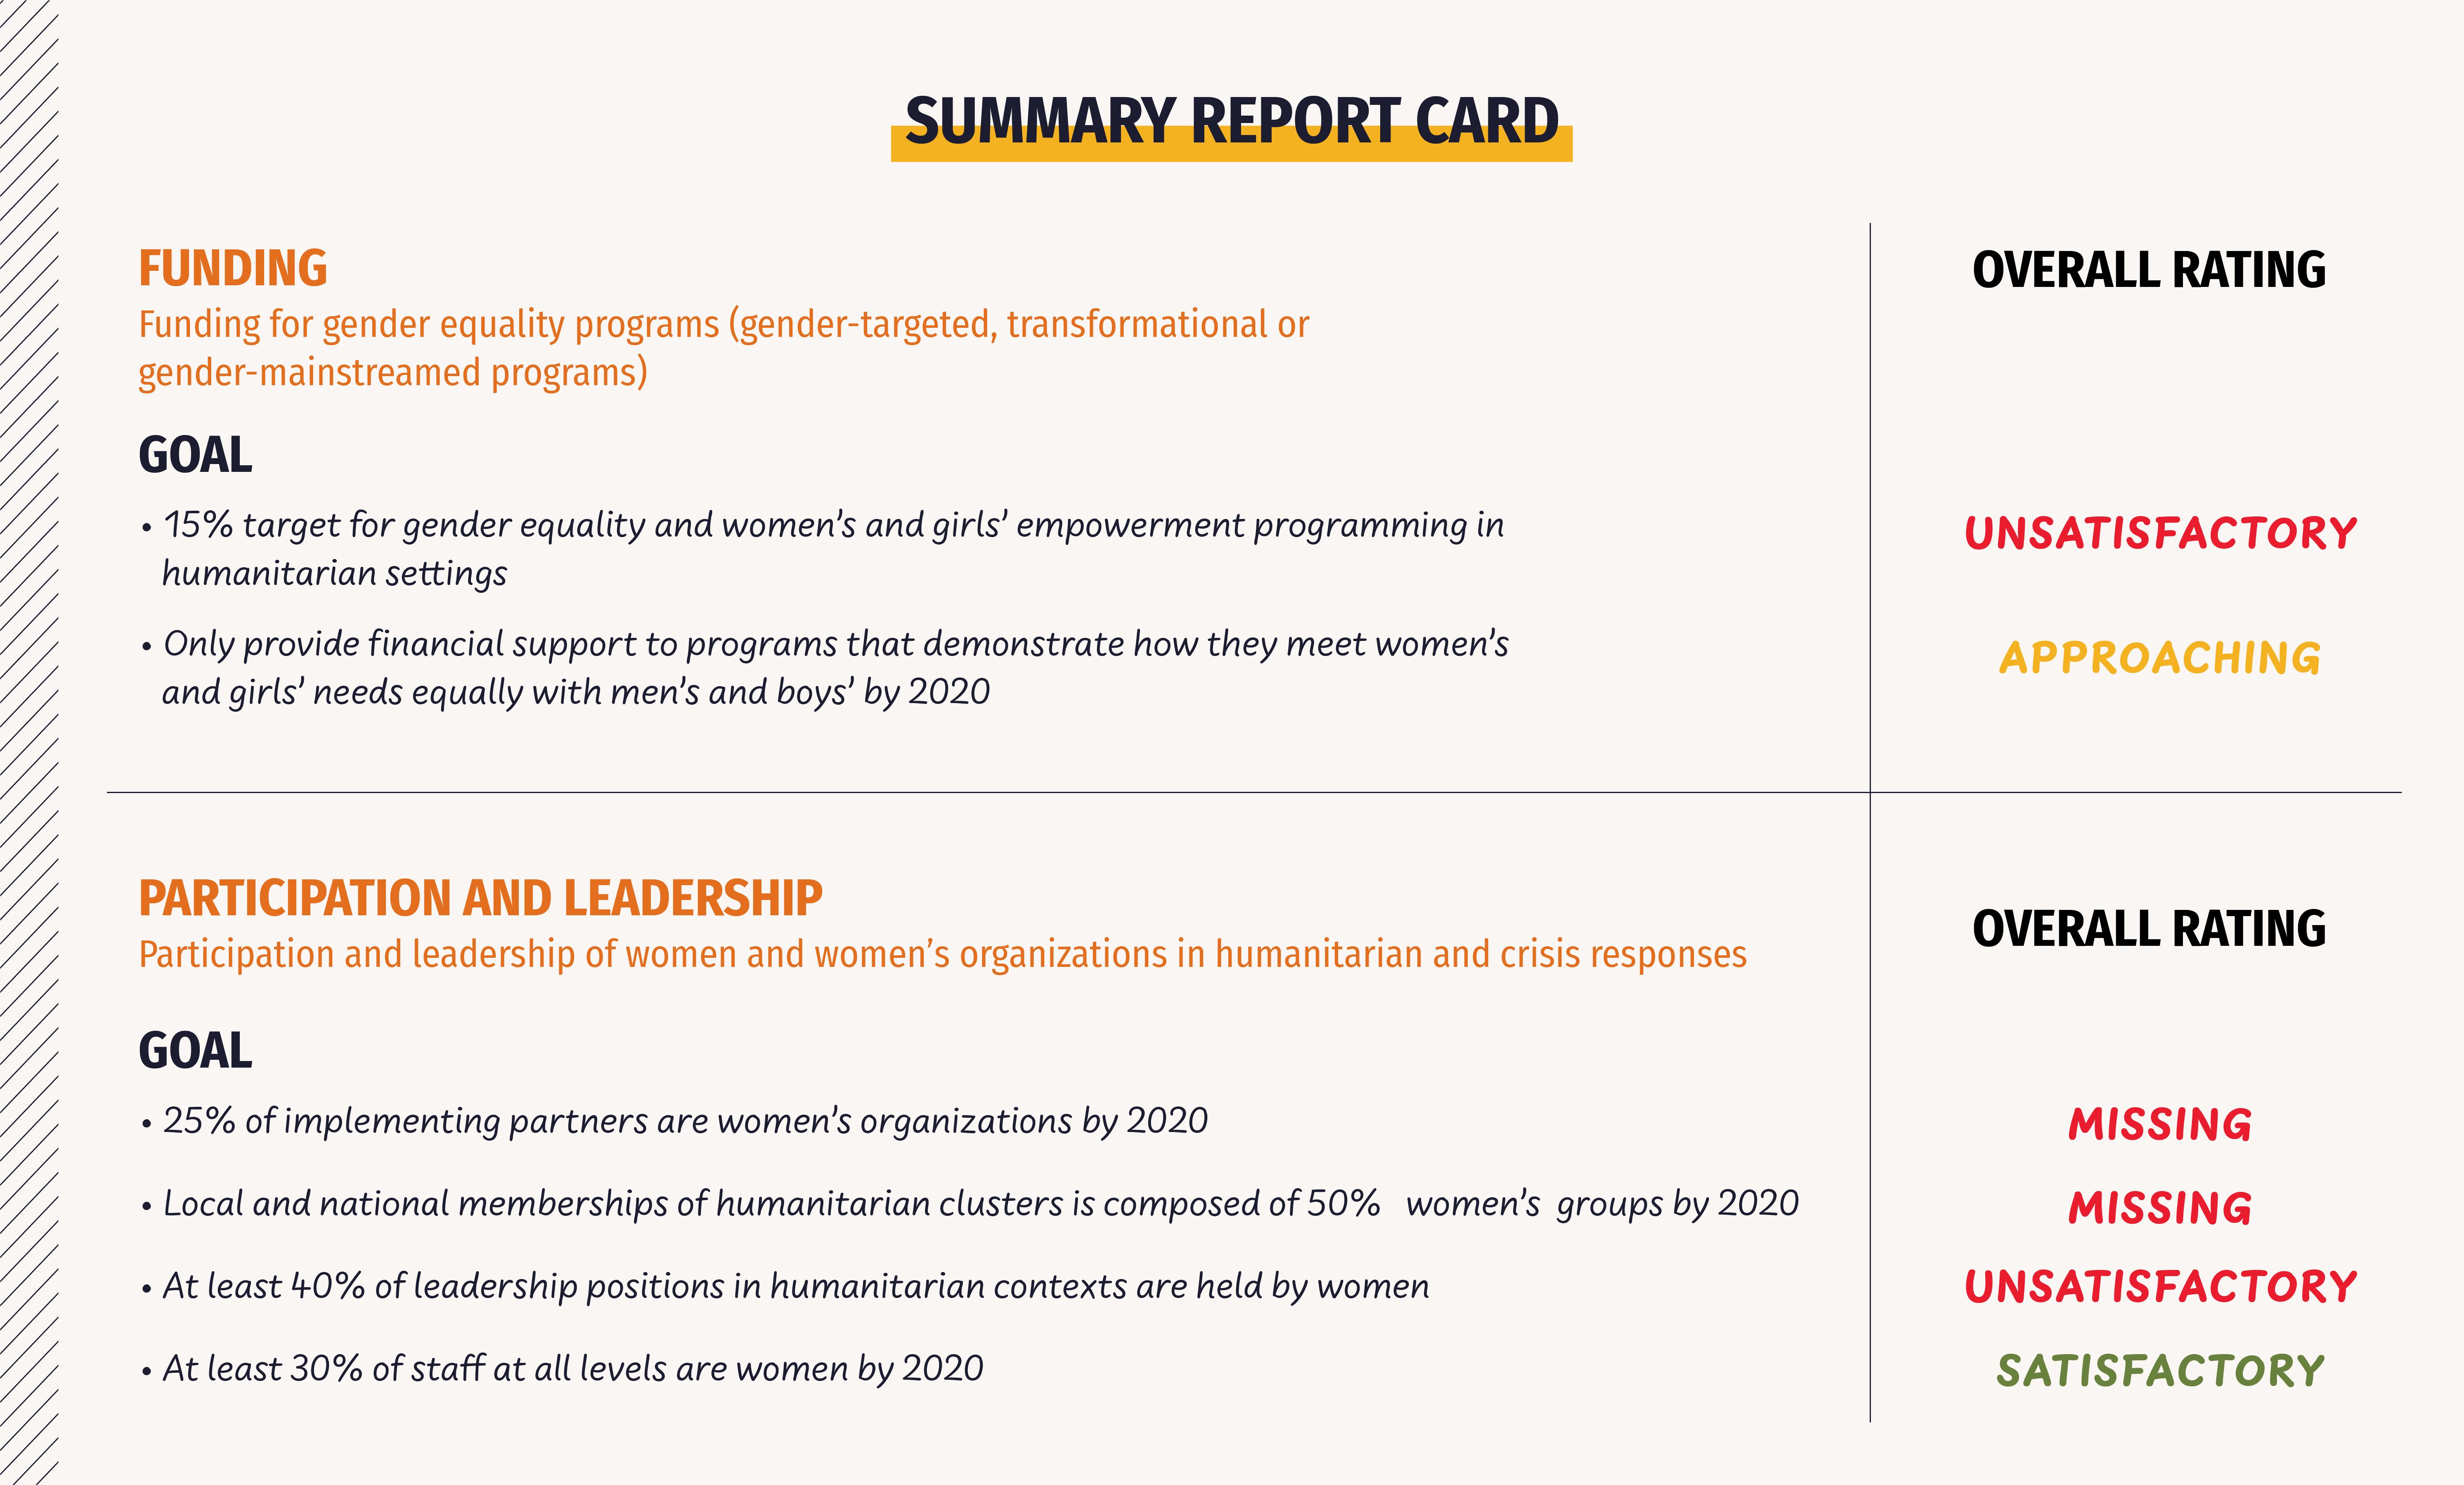 Summary Report Card